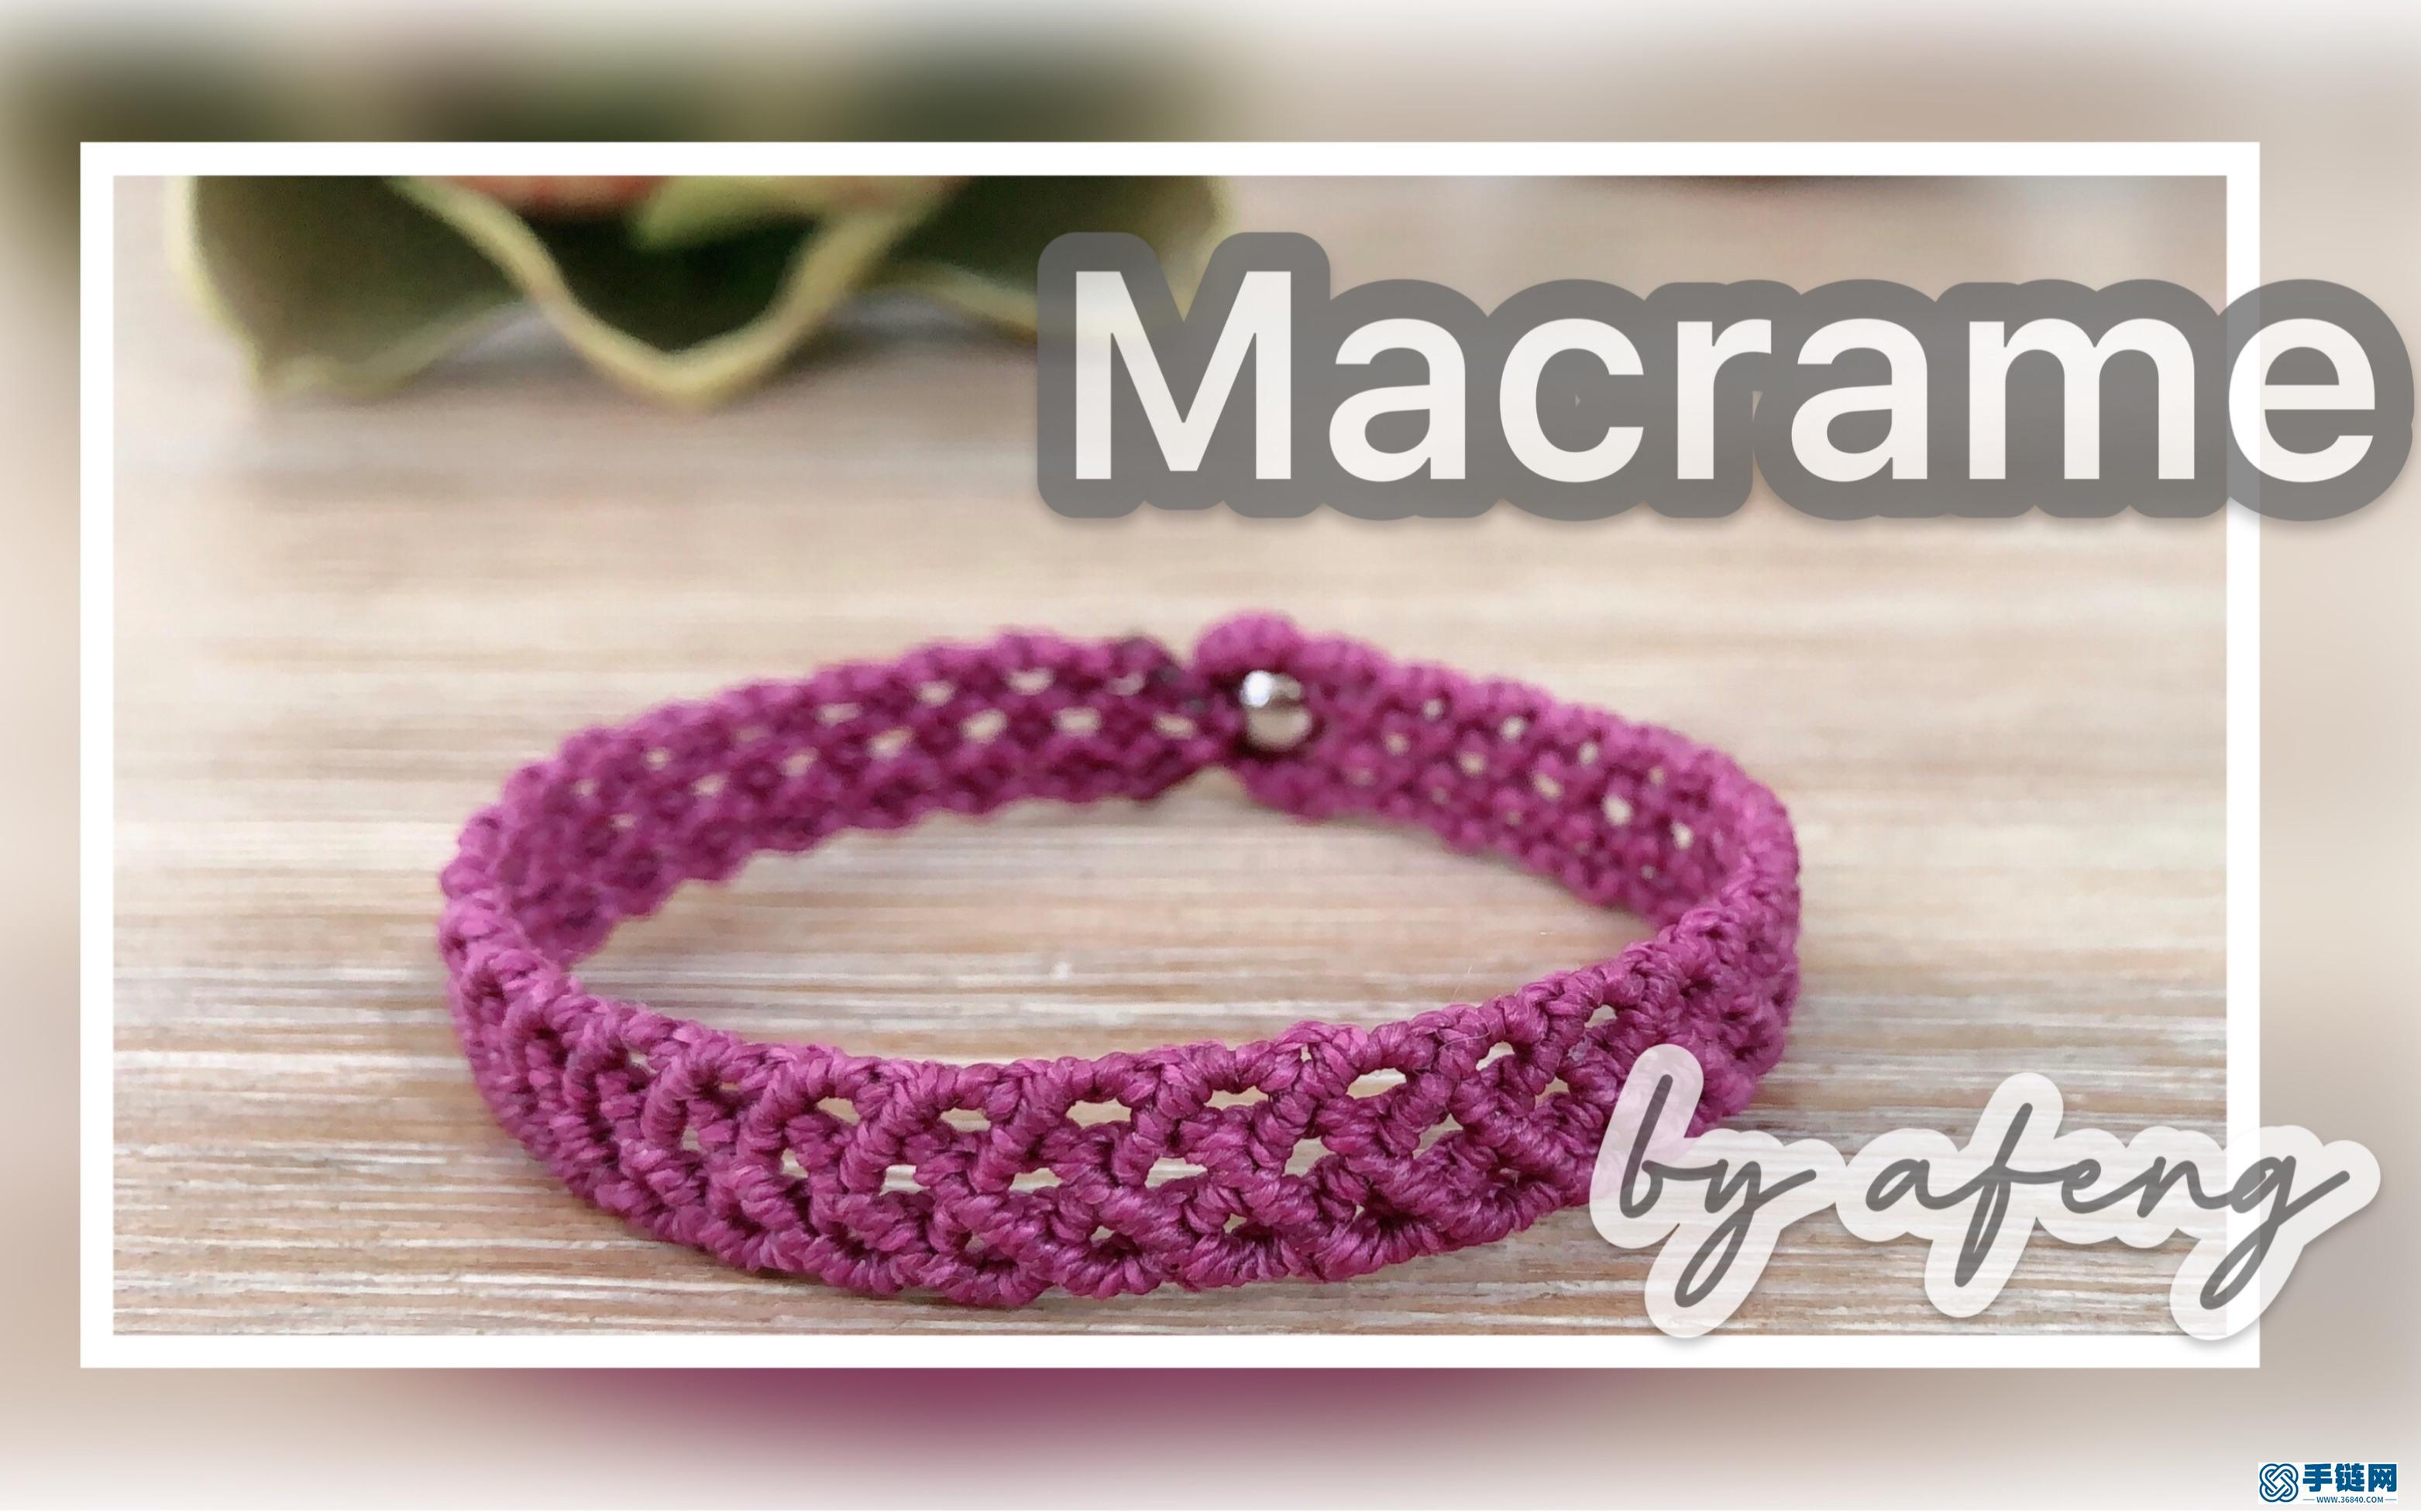 Macrame视频教程,八股编绳手链教程